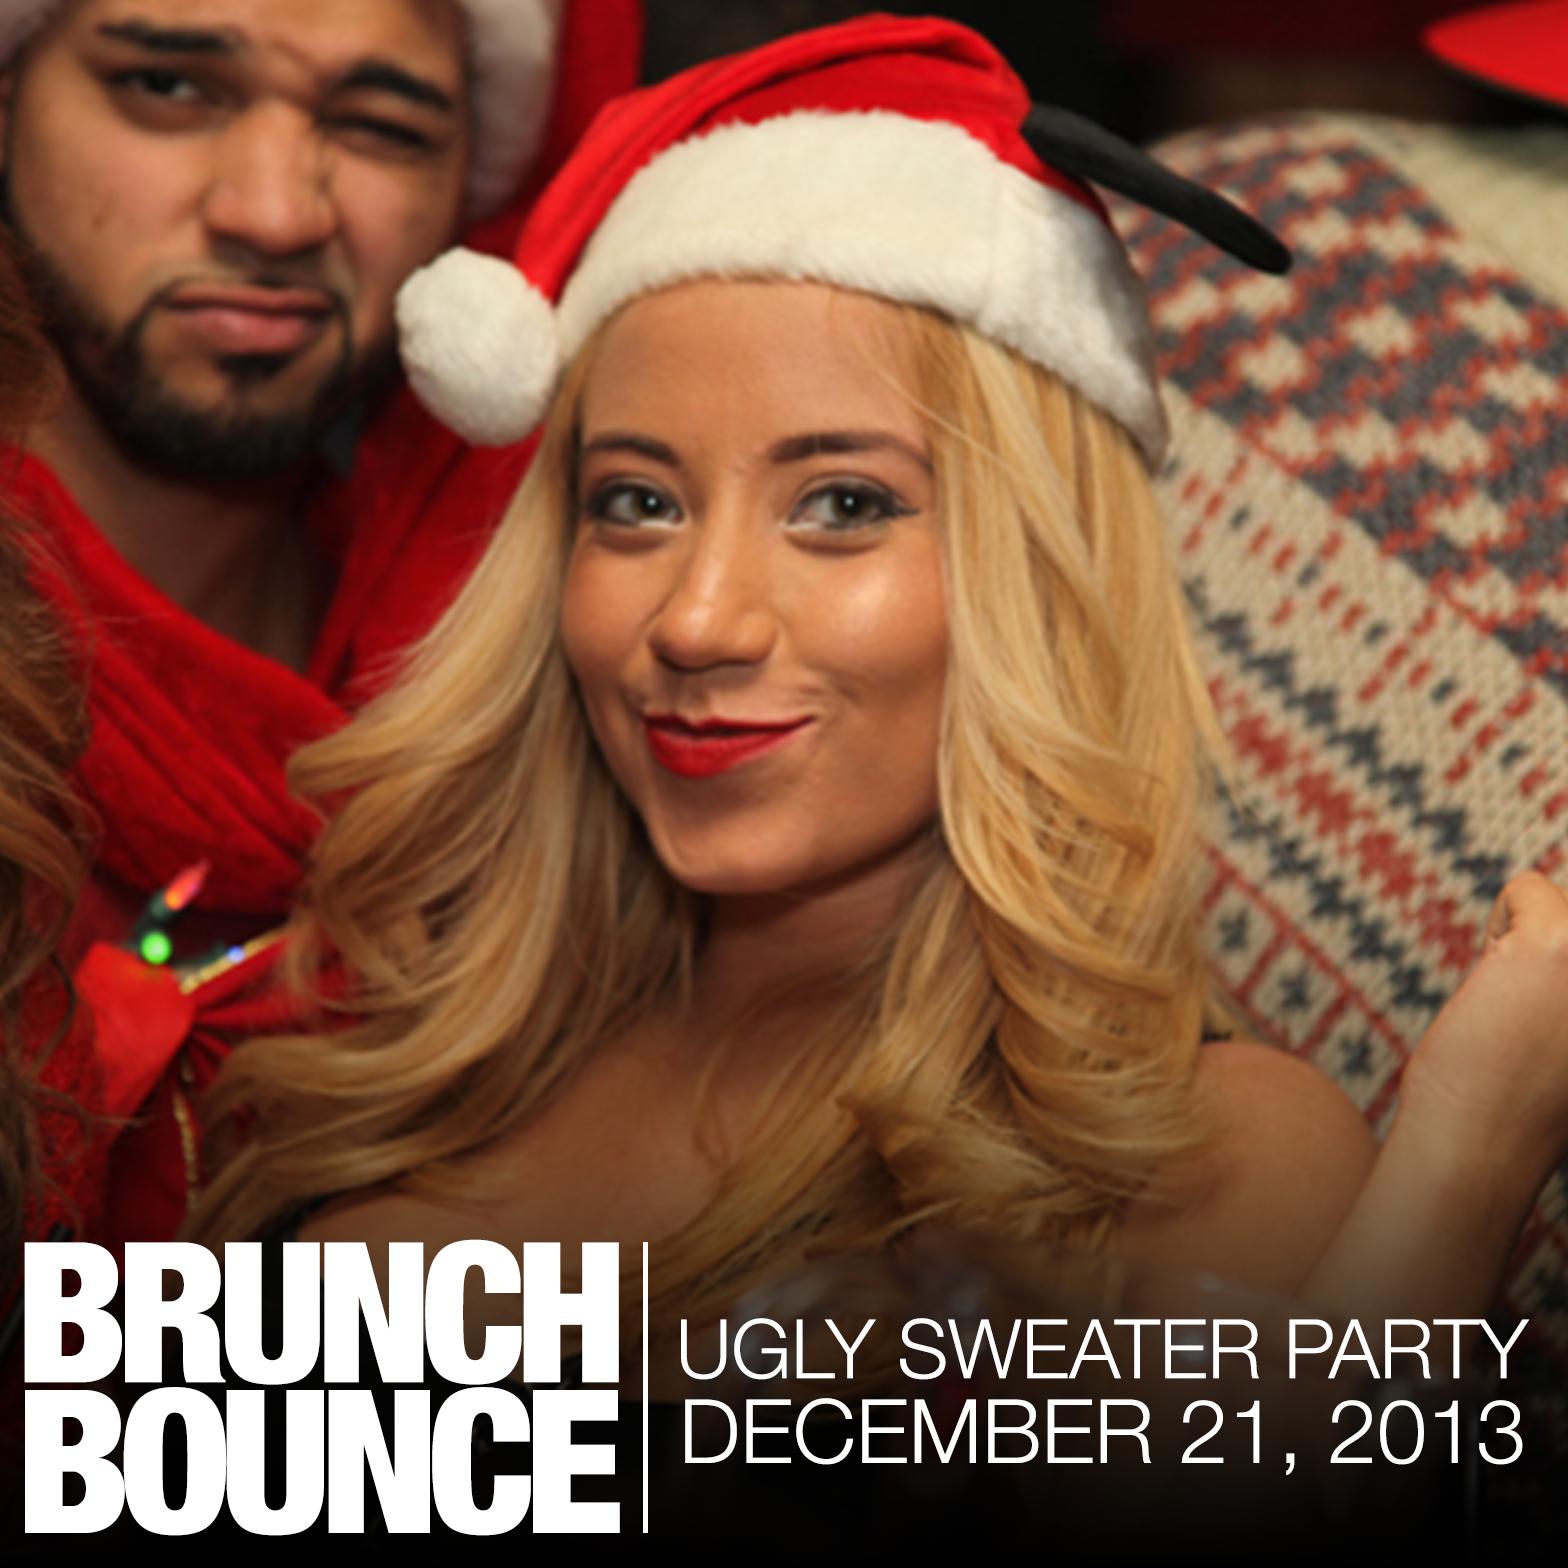 Brunch Bounce 12.21.13